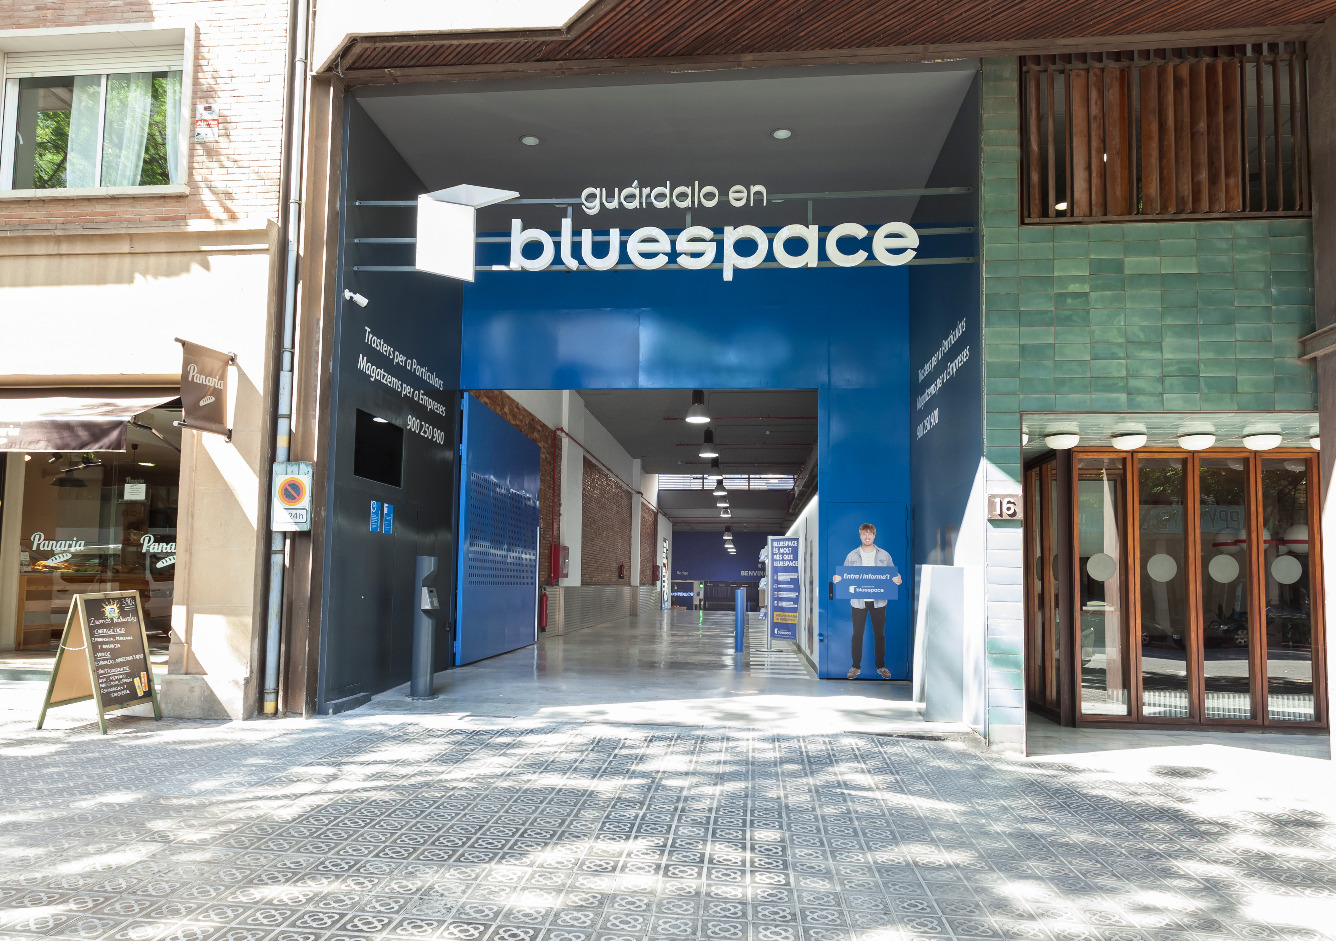 Location Entrepôt  Calle bori i fontestà, 16. Trasteros de 2,5 m2 en ganduxer (barcelona). tenemos diferentes